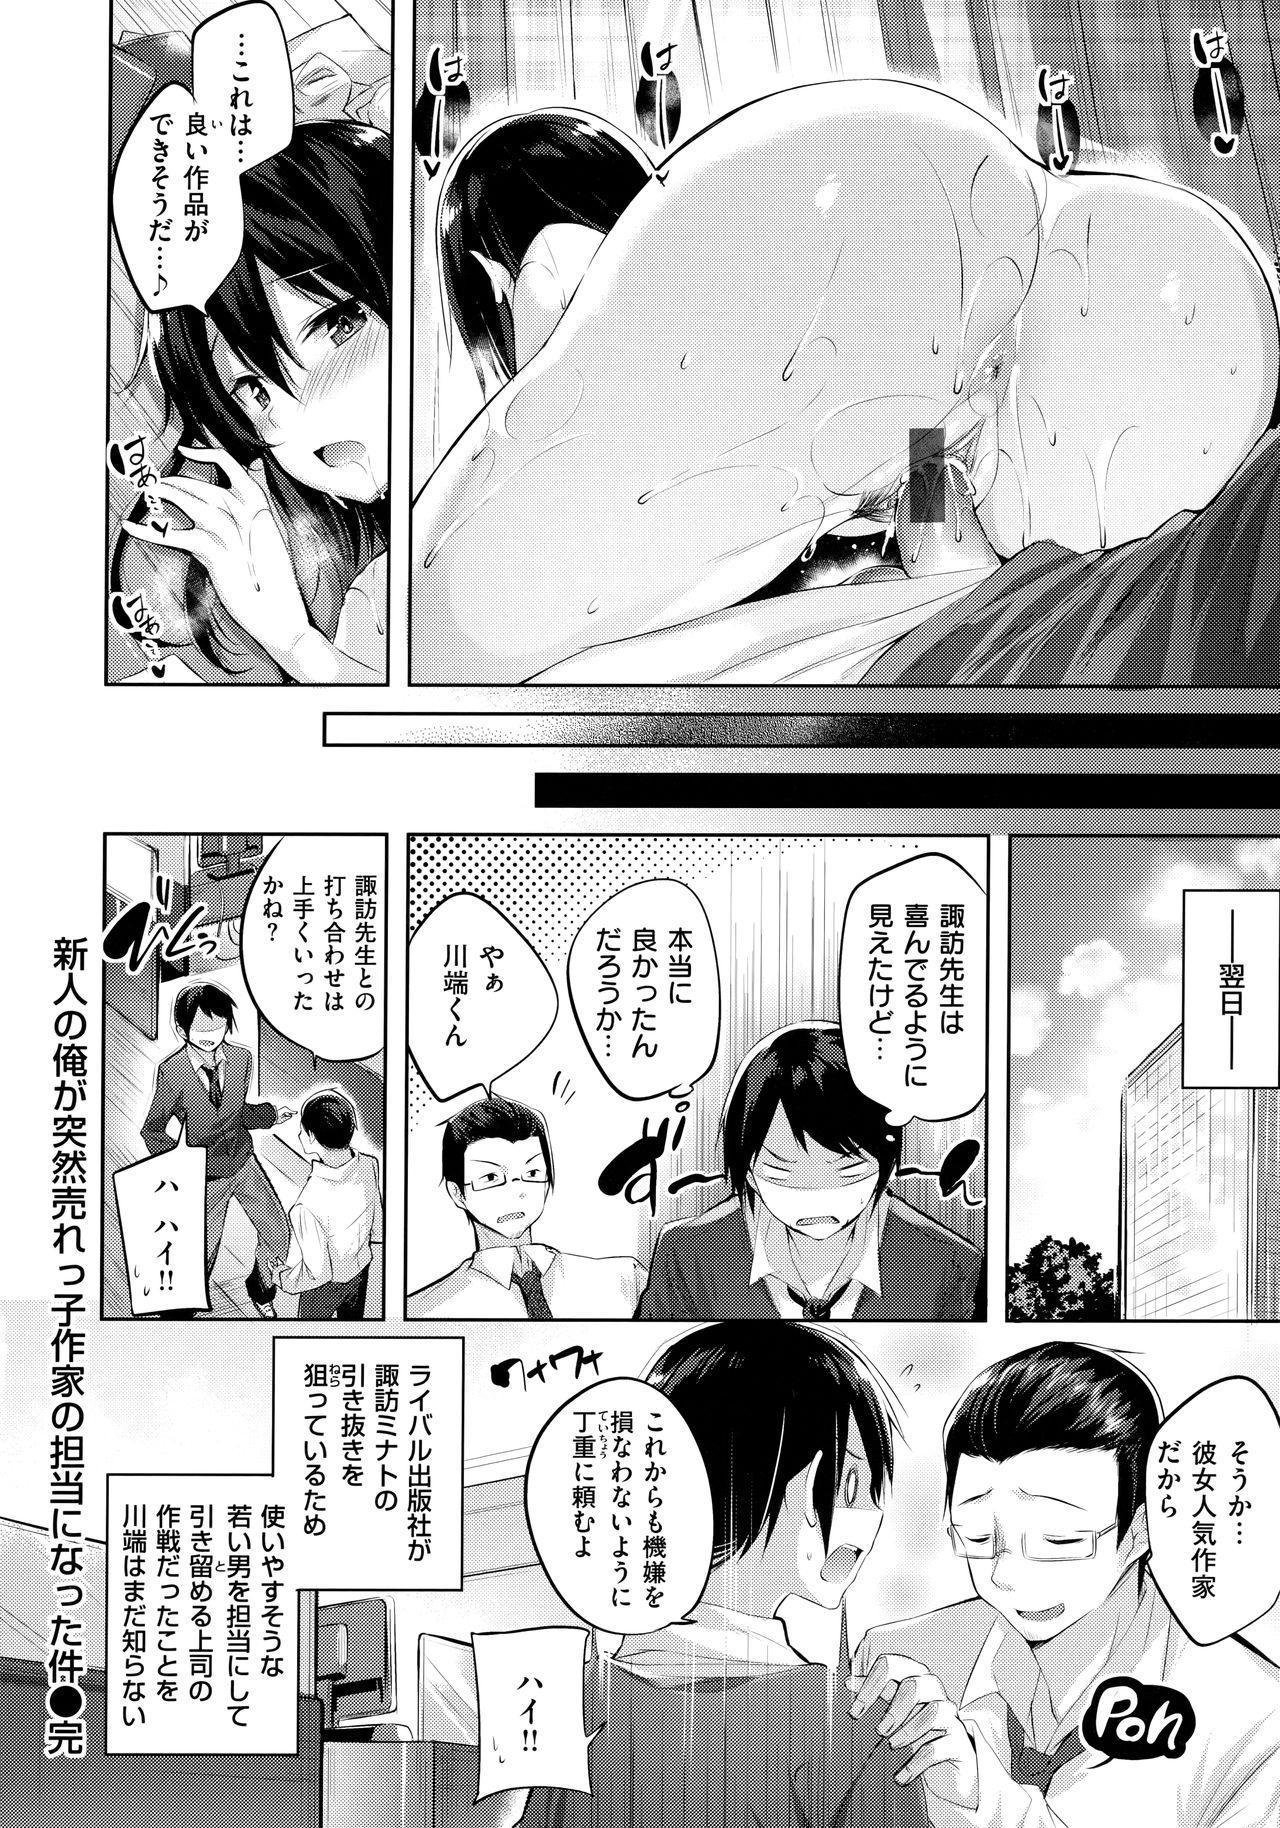 Nakadashi Strike! - Winning strike! 177